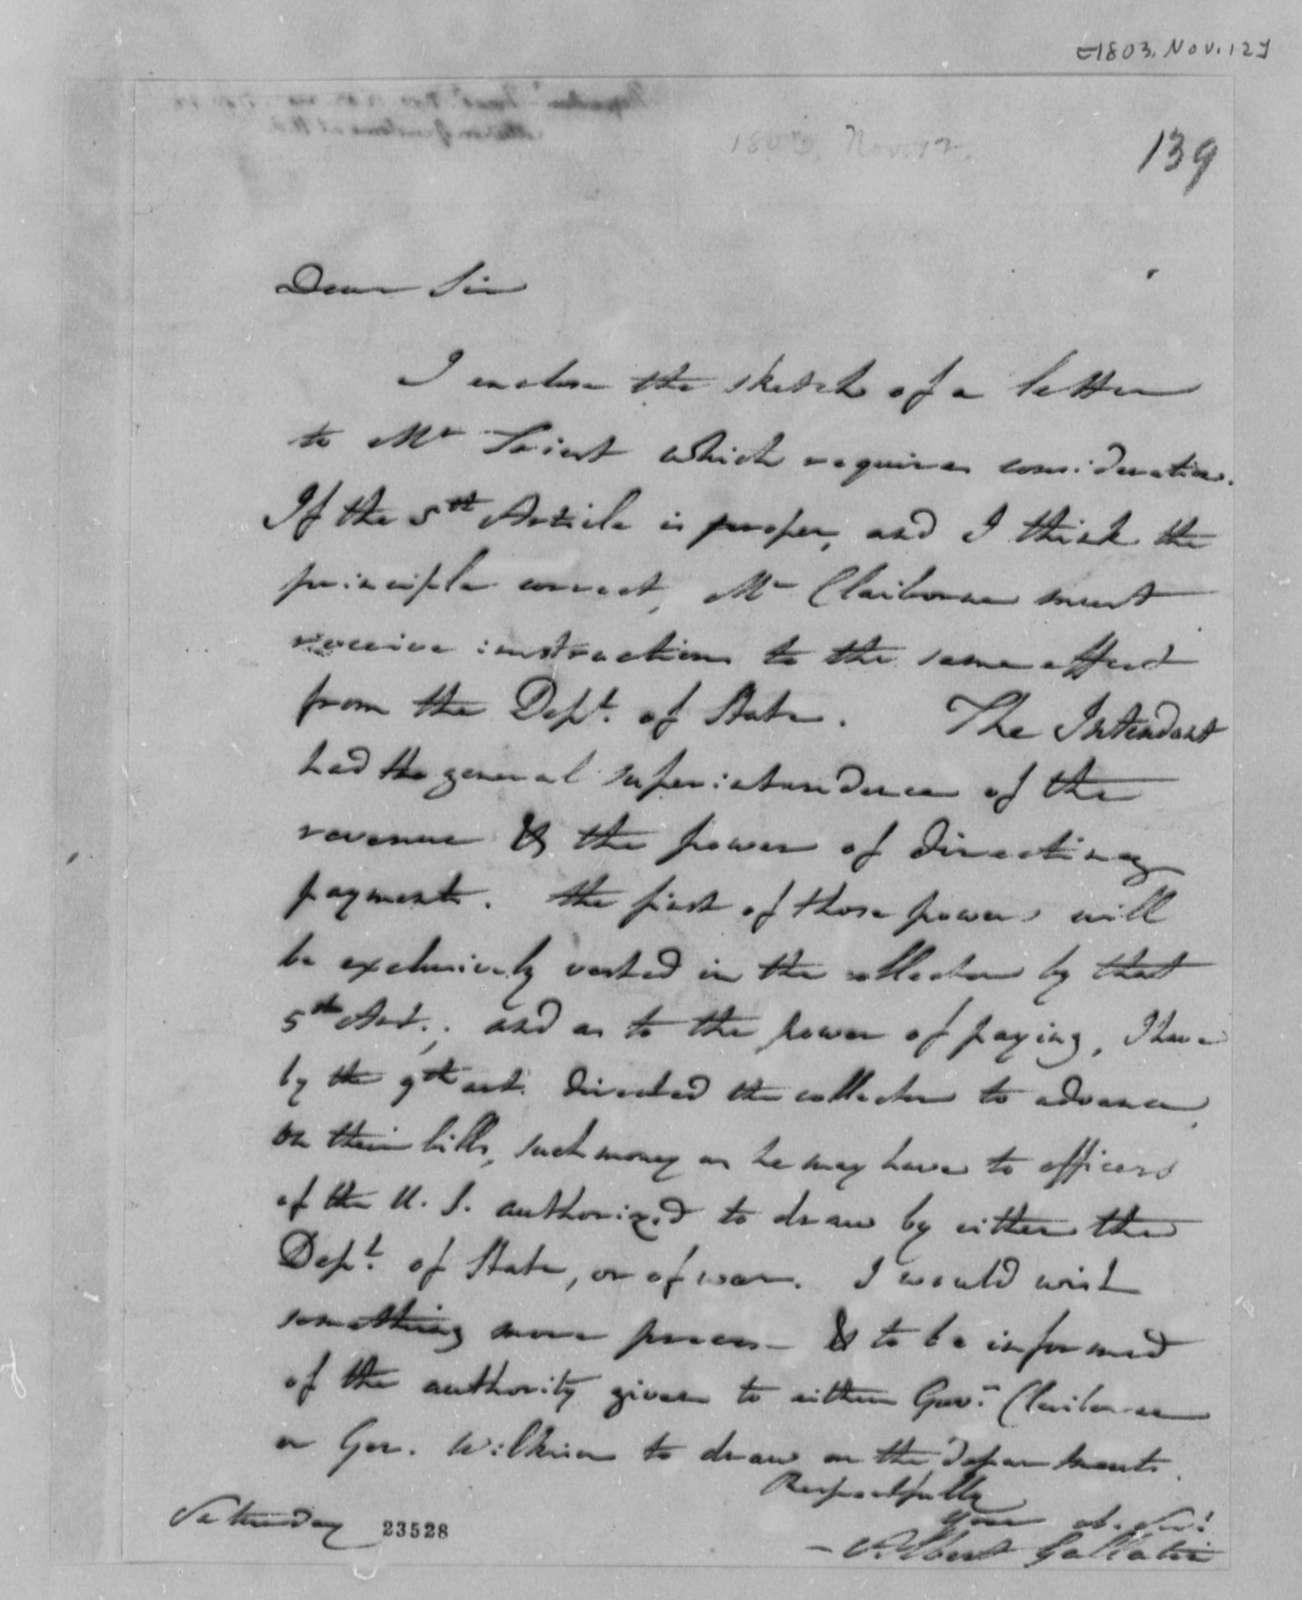 Albert Gallatin to Thomas Jefferson, November 12, 1803